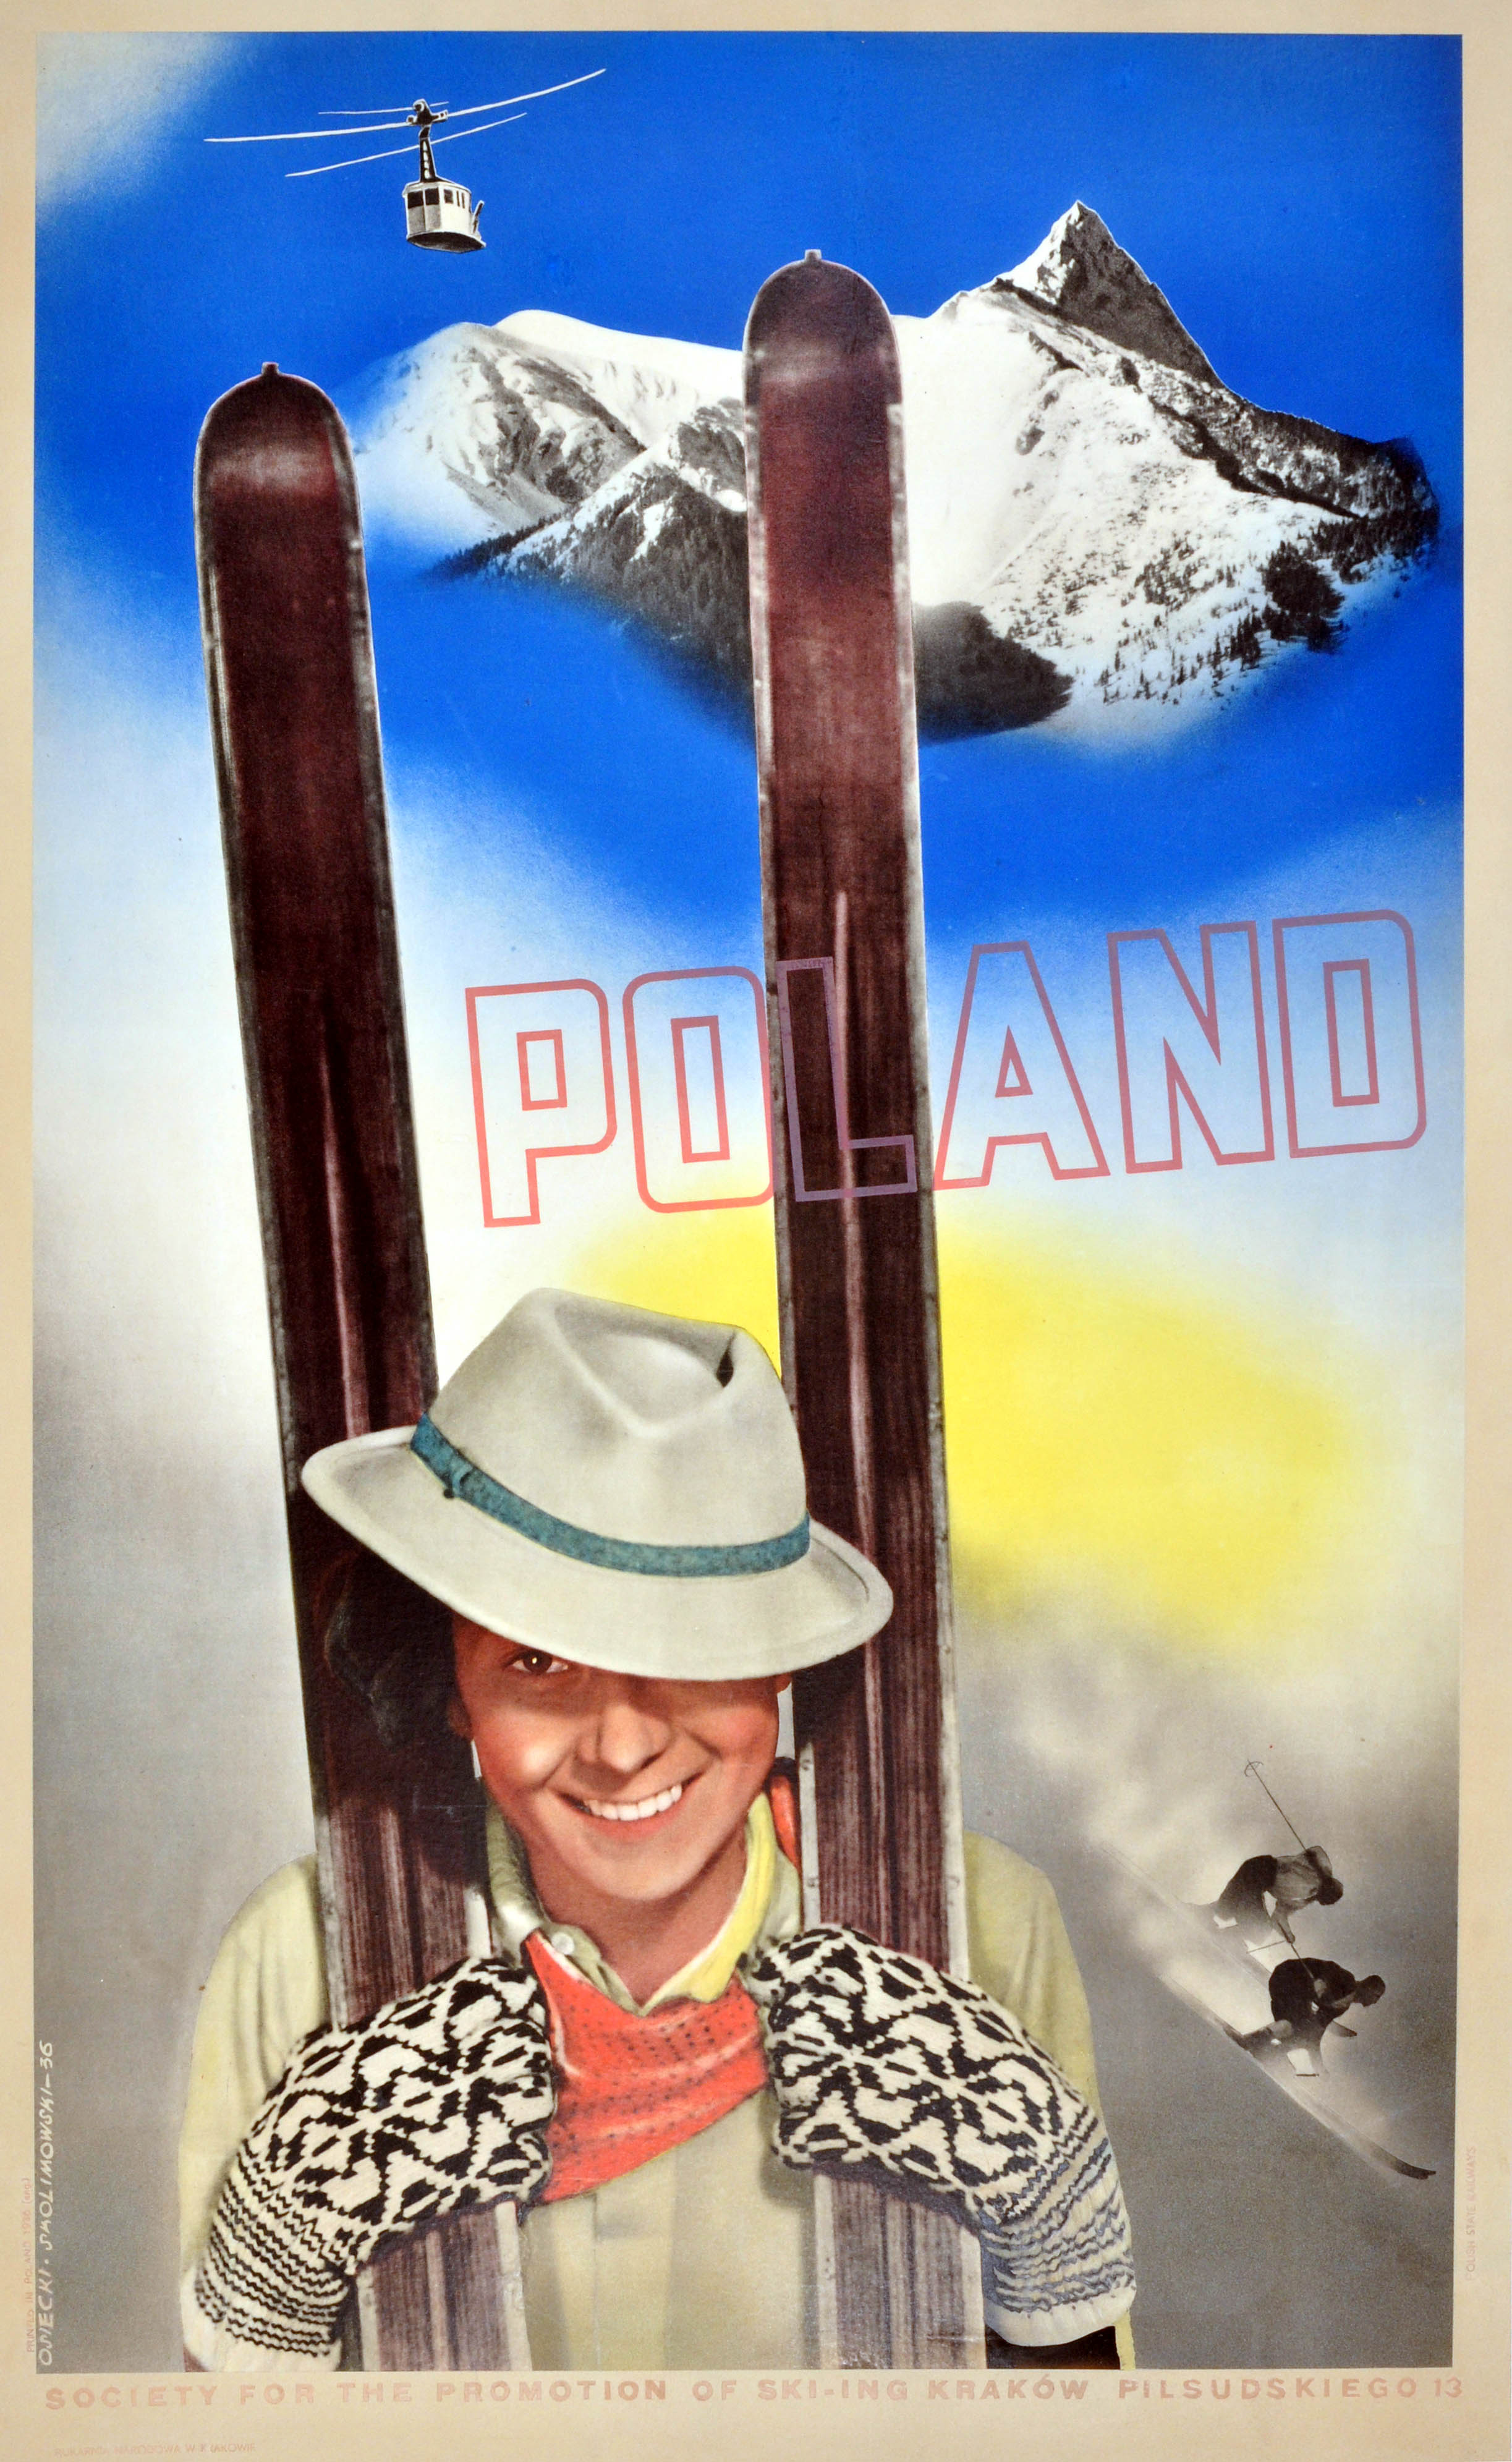 I Del Palacio  Original Mid Century Modern Poster For The